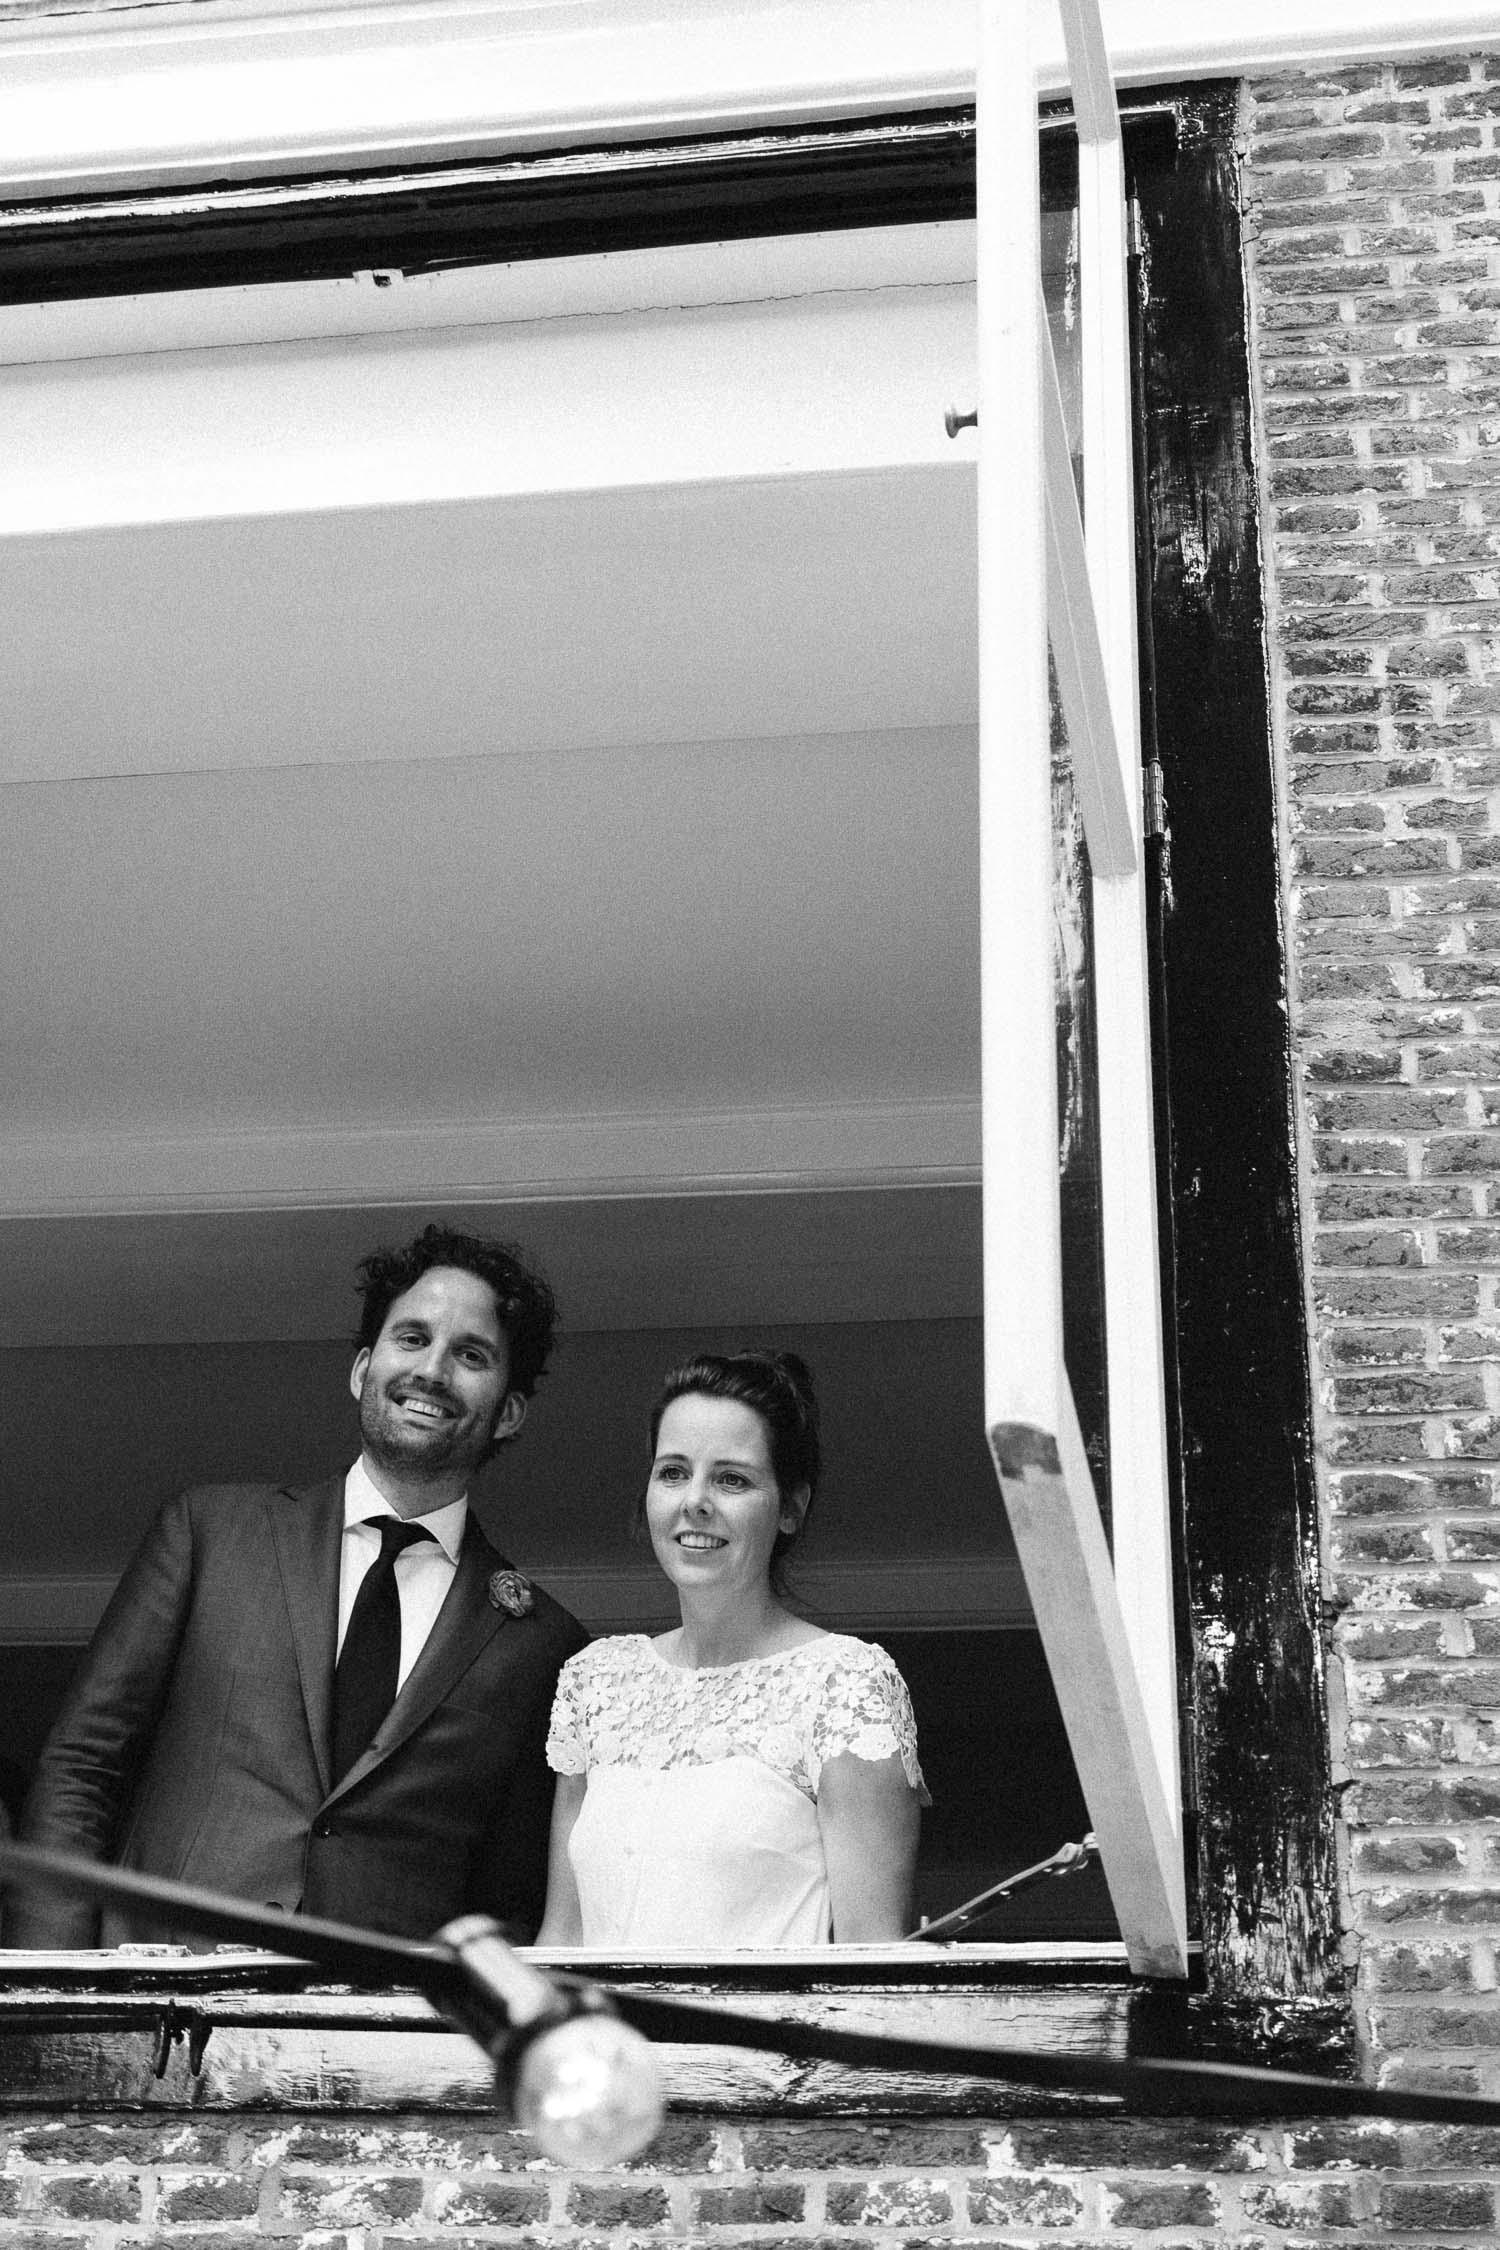 Backyard-wedding-Bruiloft-Annemiek-David-fotografie-photography-On-a-hazy-morning-Amsterdam-The-Netherlands405.jpg